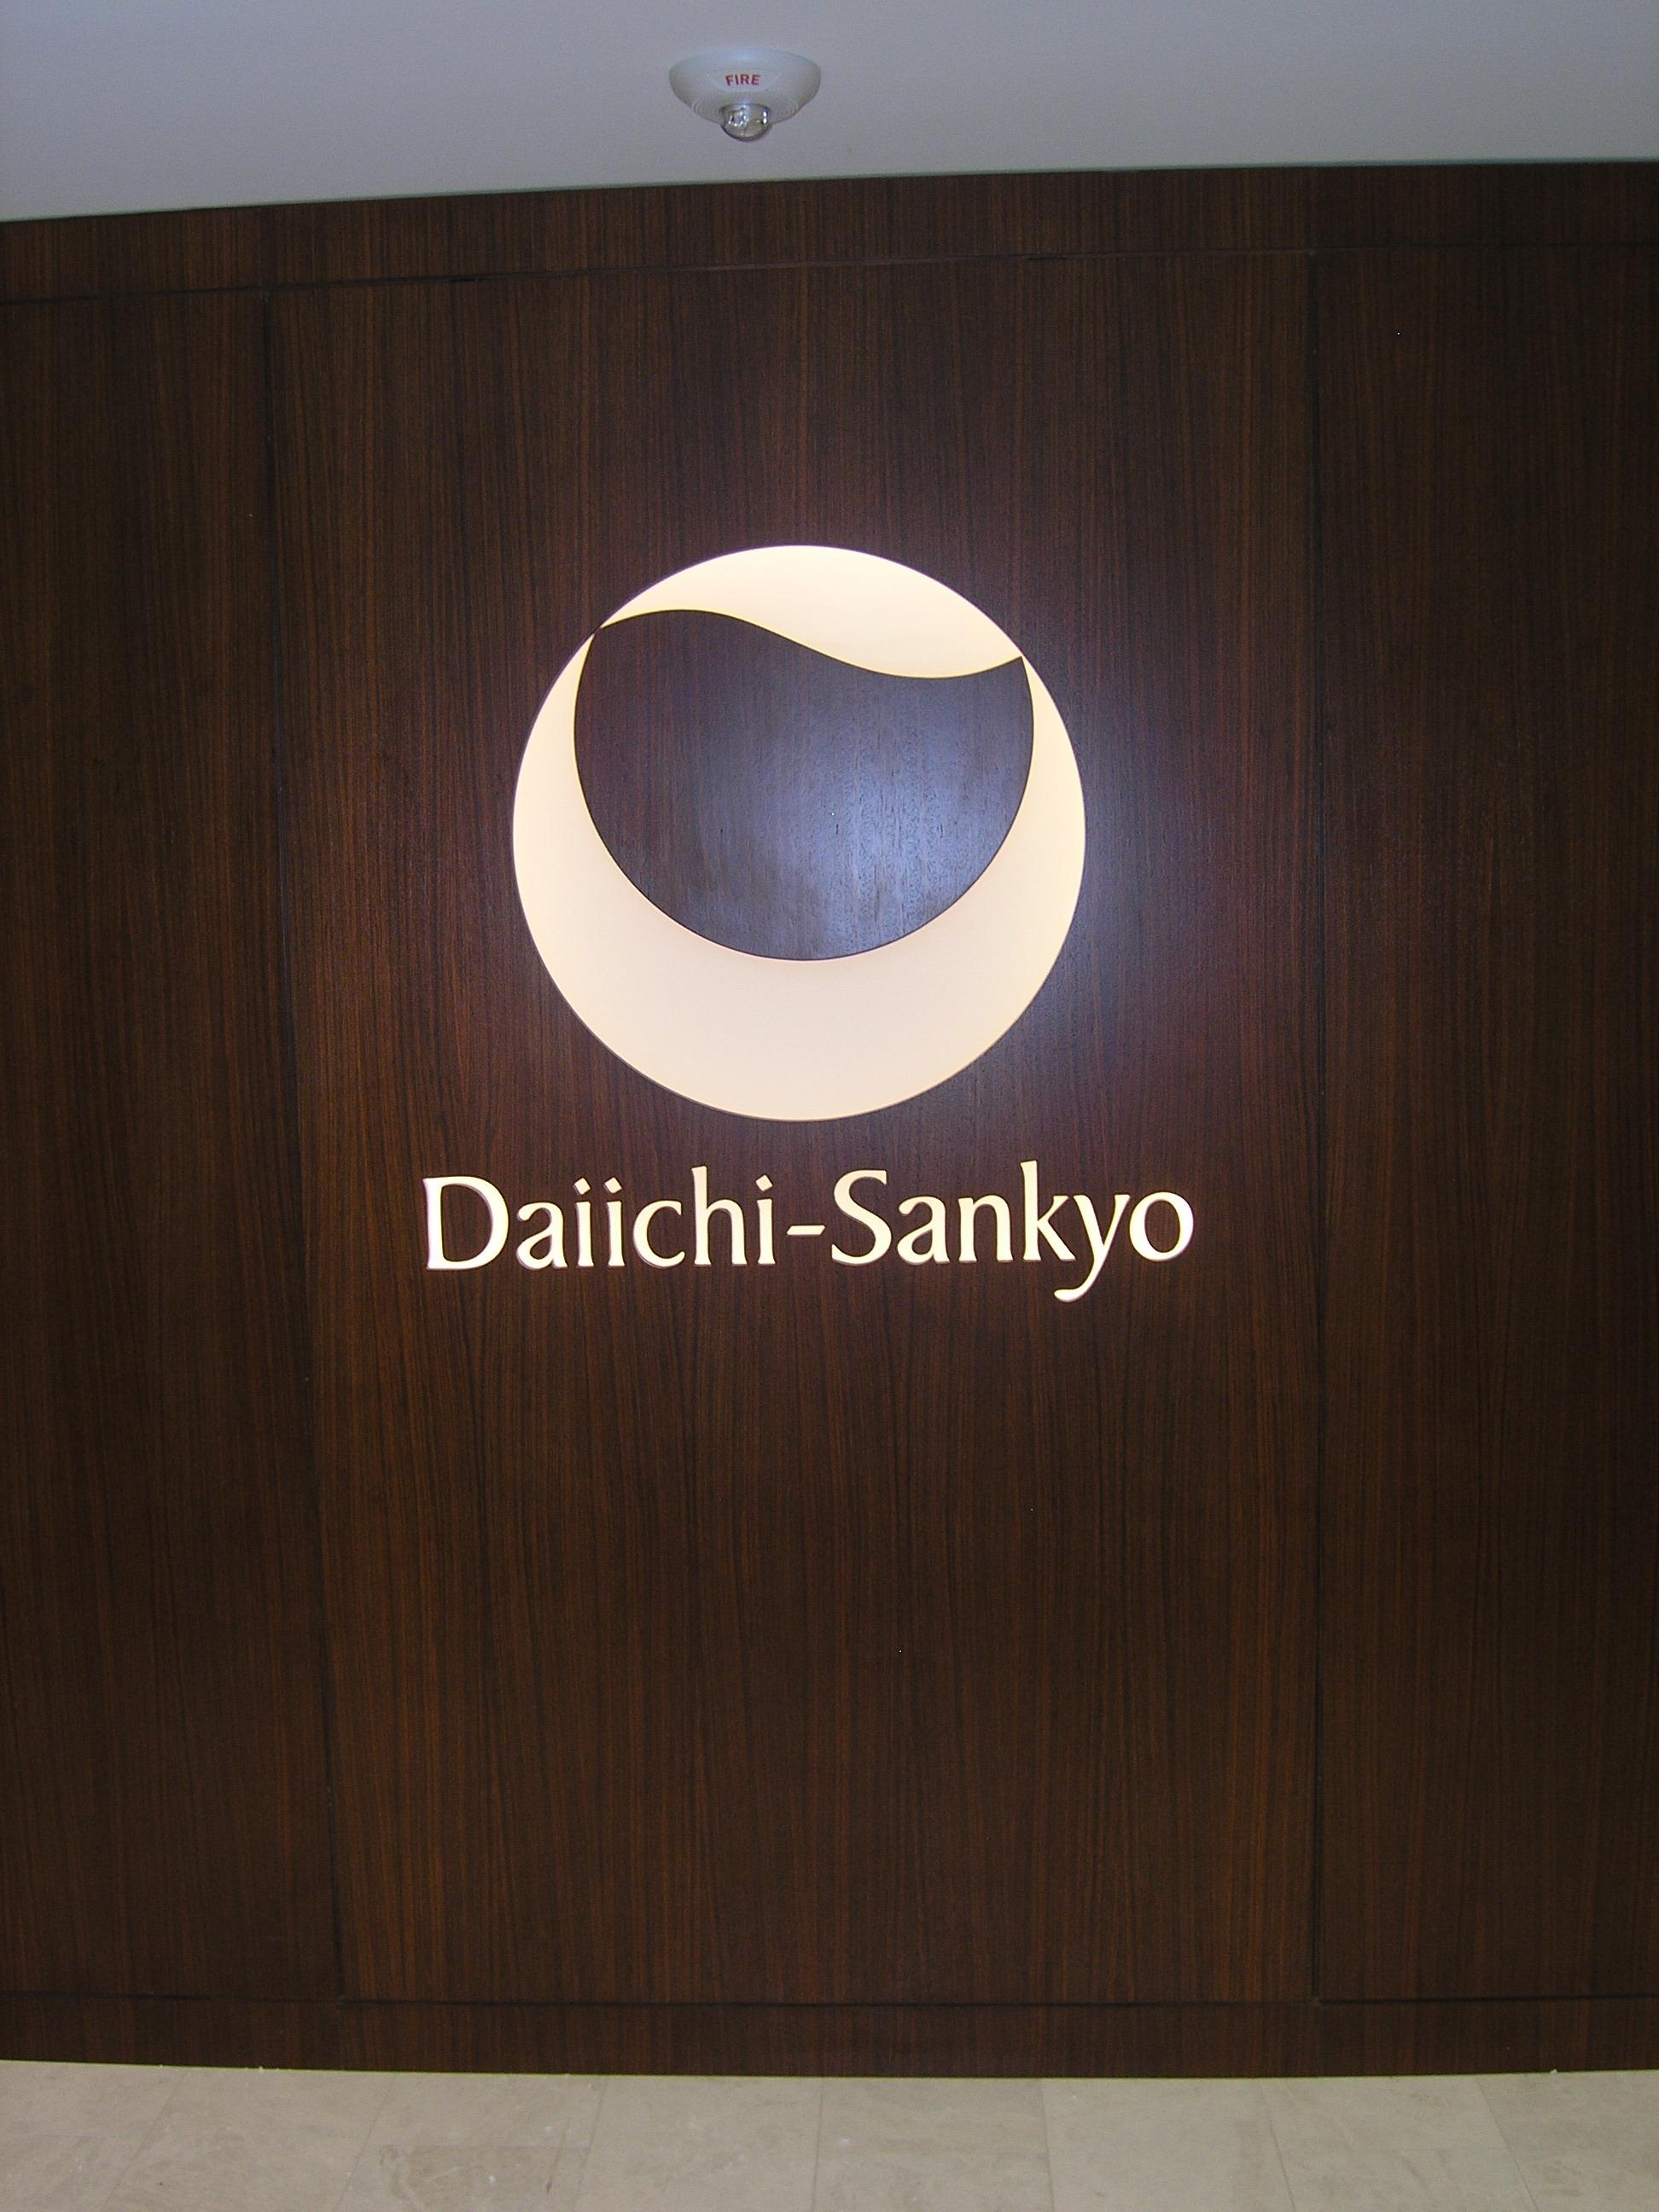 m_projects_0- Old Jobs_Daiichi Sankyo_DAIICHI SANKIO JOB 15143_PIX_Final_P1260252.JPG